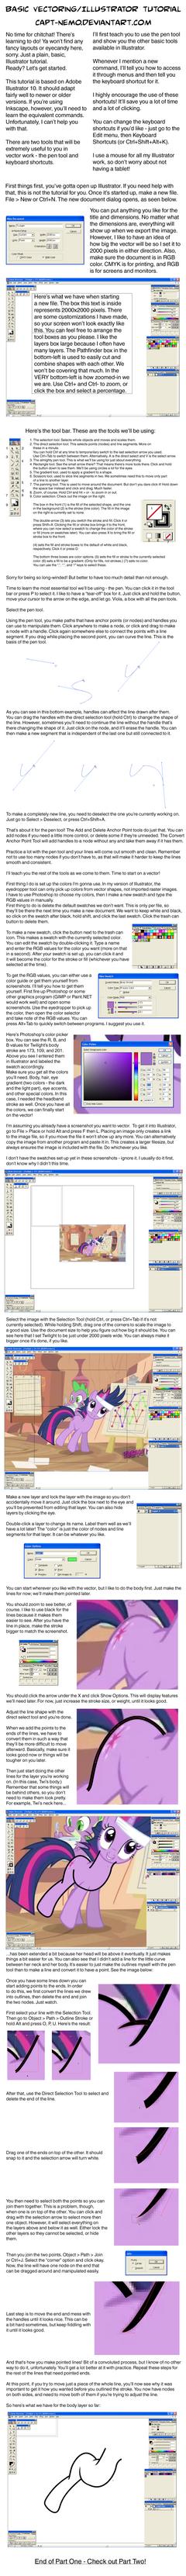 Illustrator/Vector Tutorial Part One by Capt-Nemo